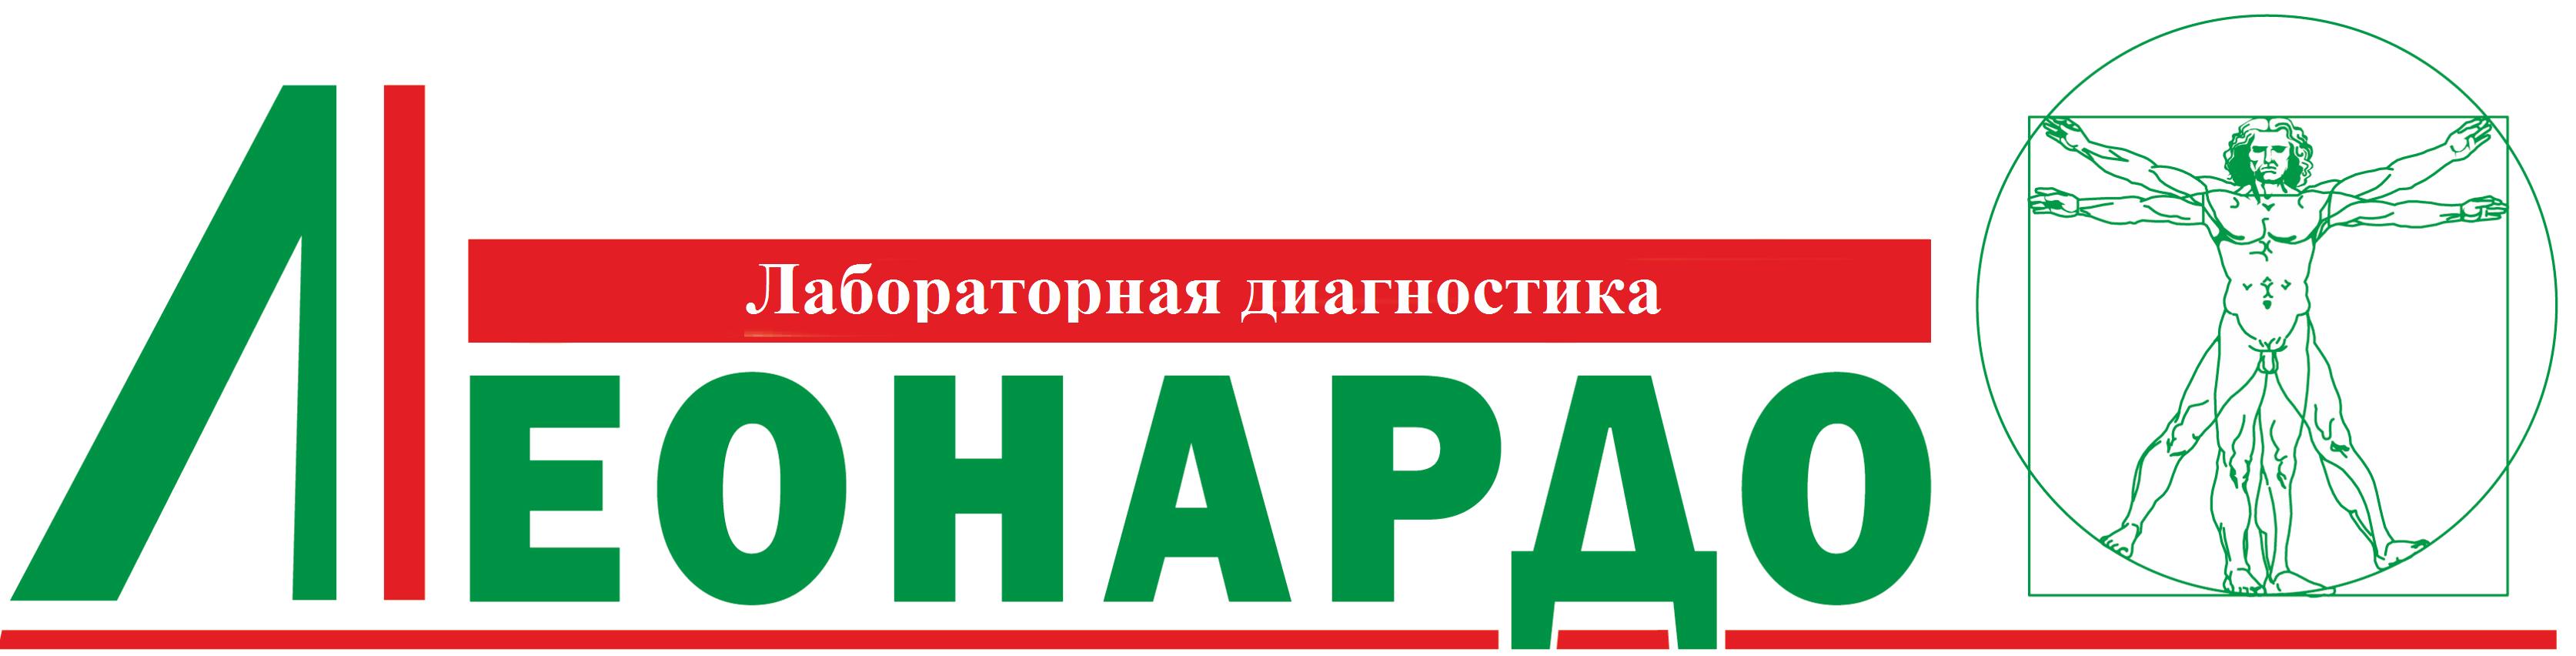 ФОП ГРІНЬОВ О.В.